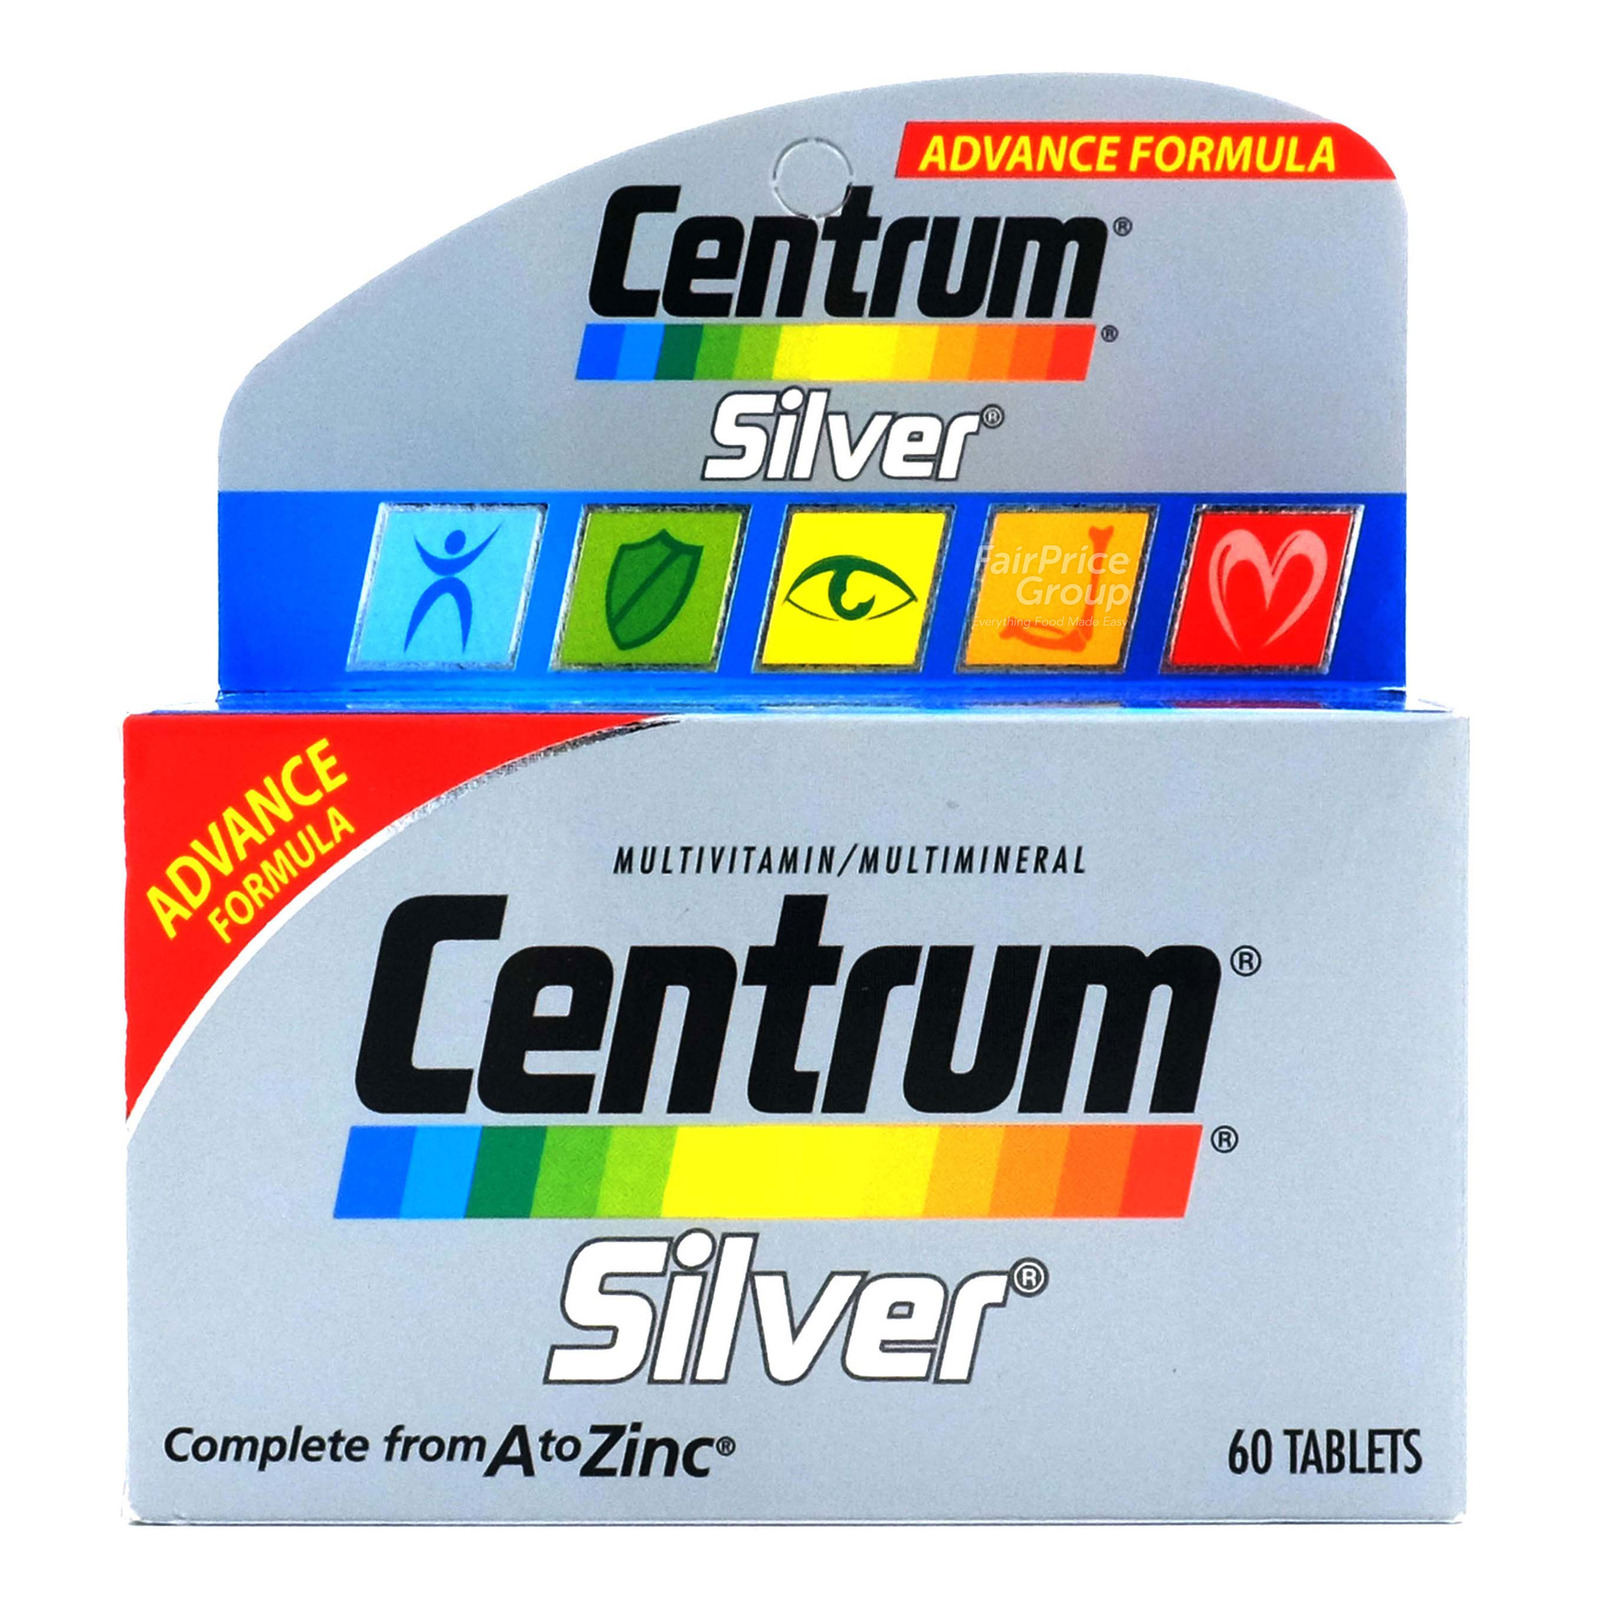 Centrum Multi Vitamin Tablets - Silver